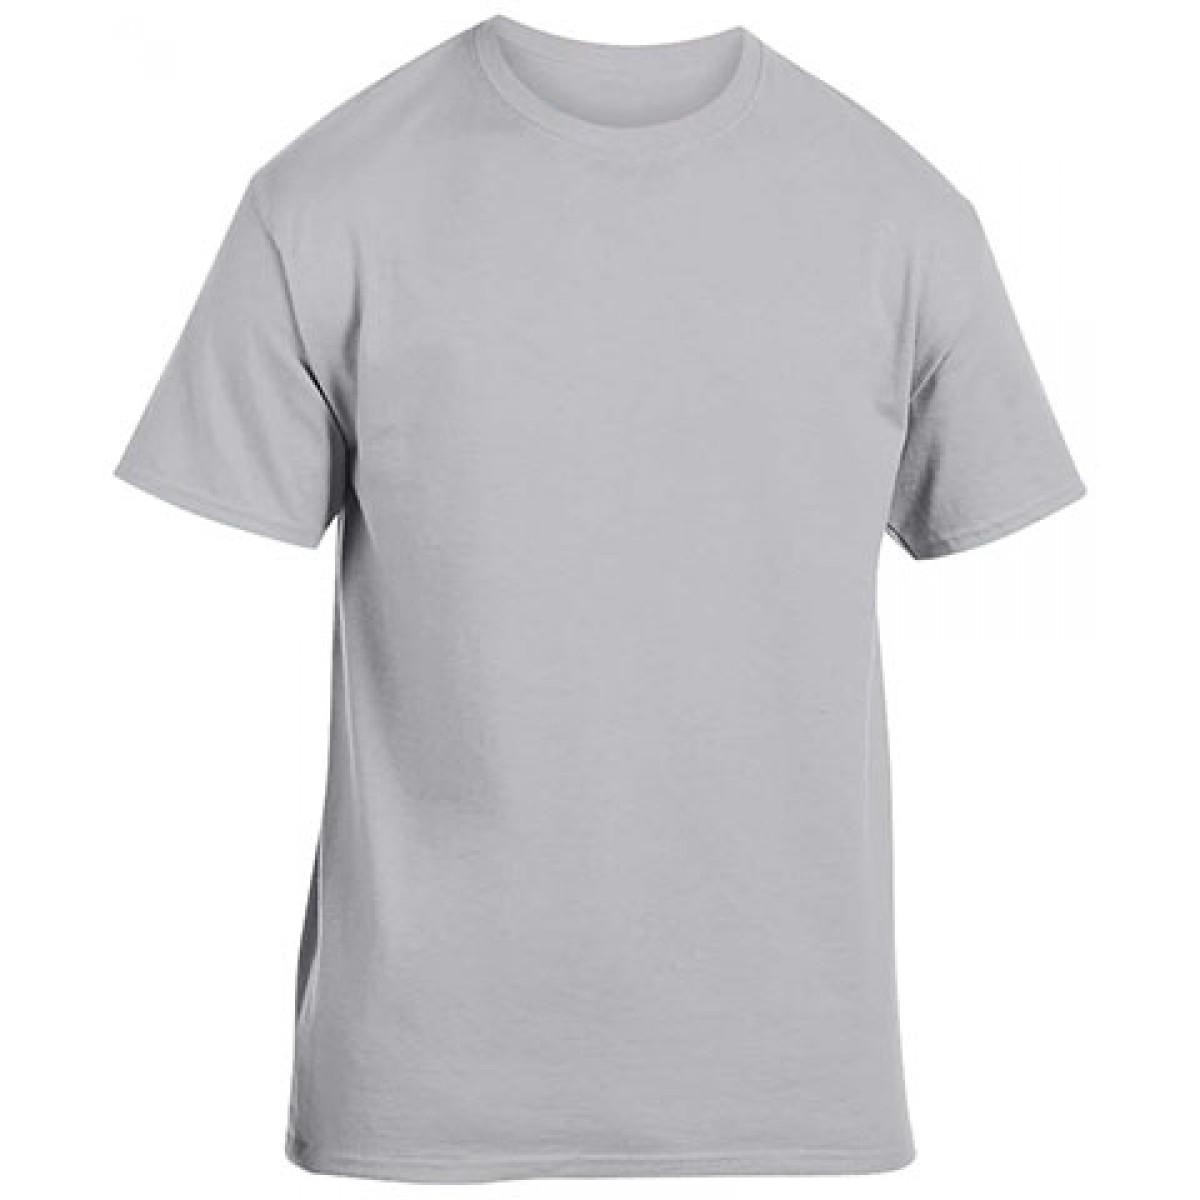 Cotton Short Sleeve T-Shirt Gray -YS